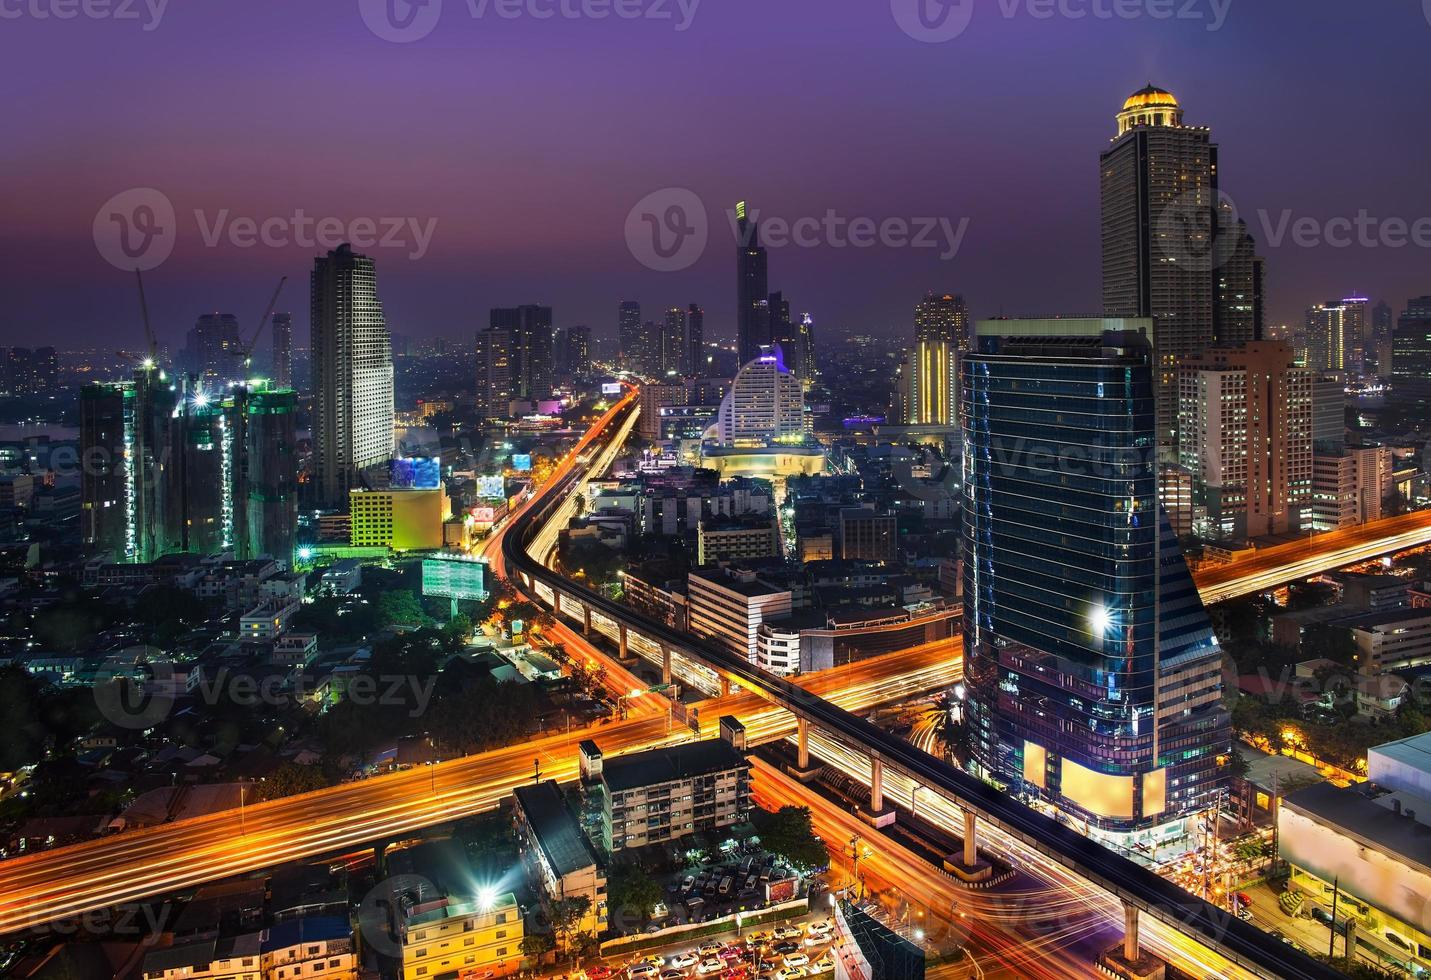 nuit ville urbaine, bangkok, thaïlande. photo